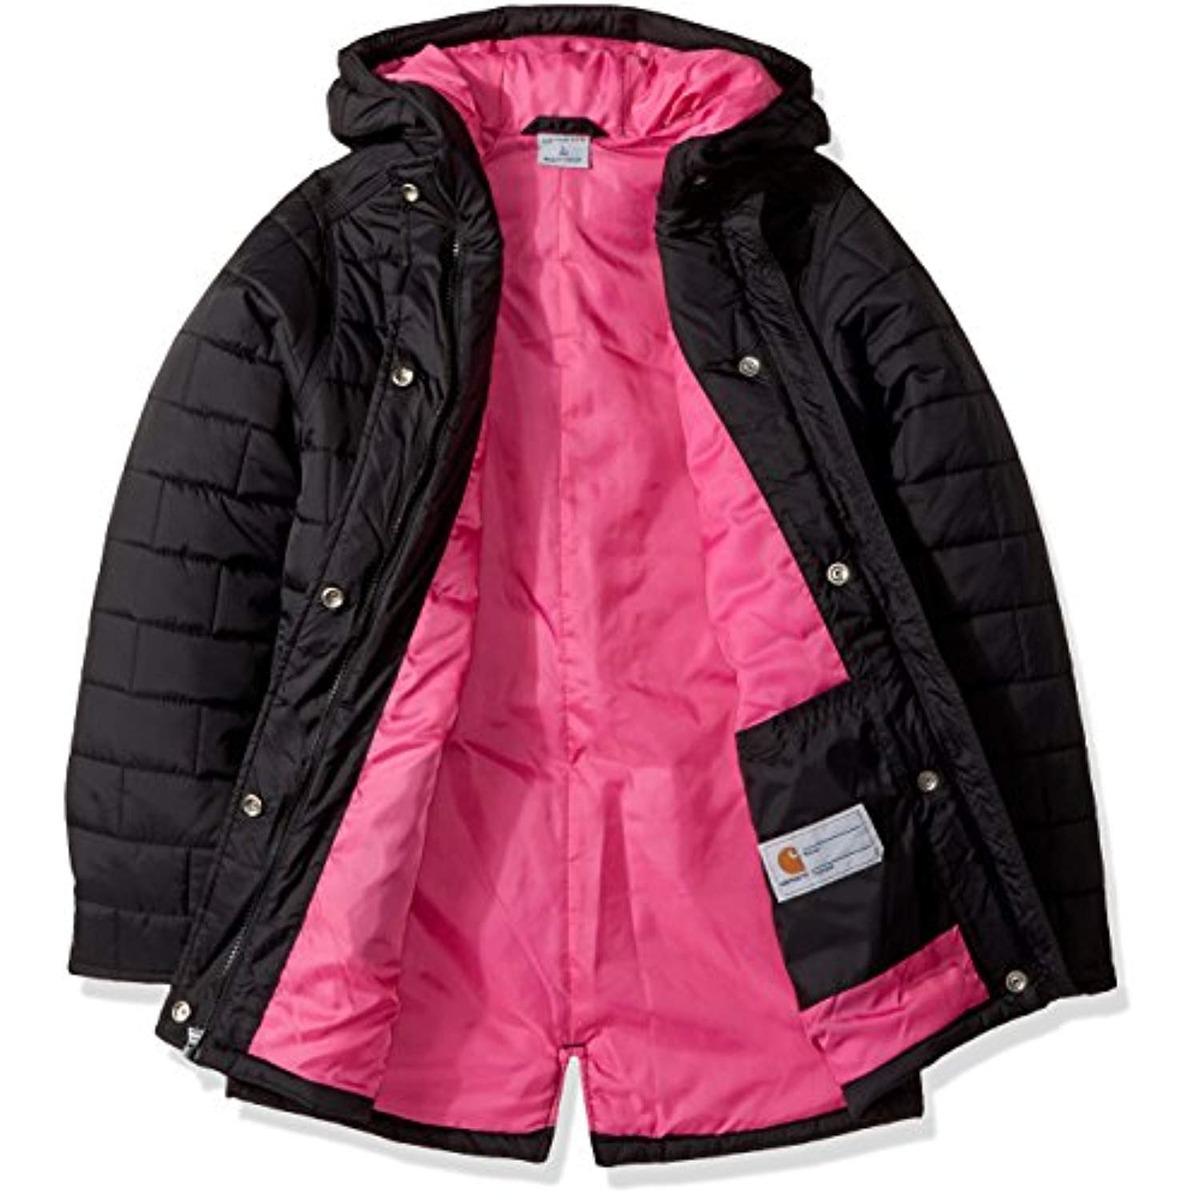 1b9f74468 Carhartt Girls Amoret Quilted Jacket - $ 3,182.41 en Mercado Libre